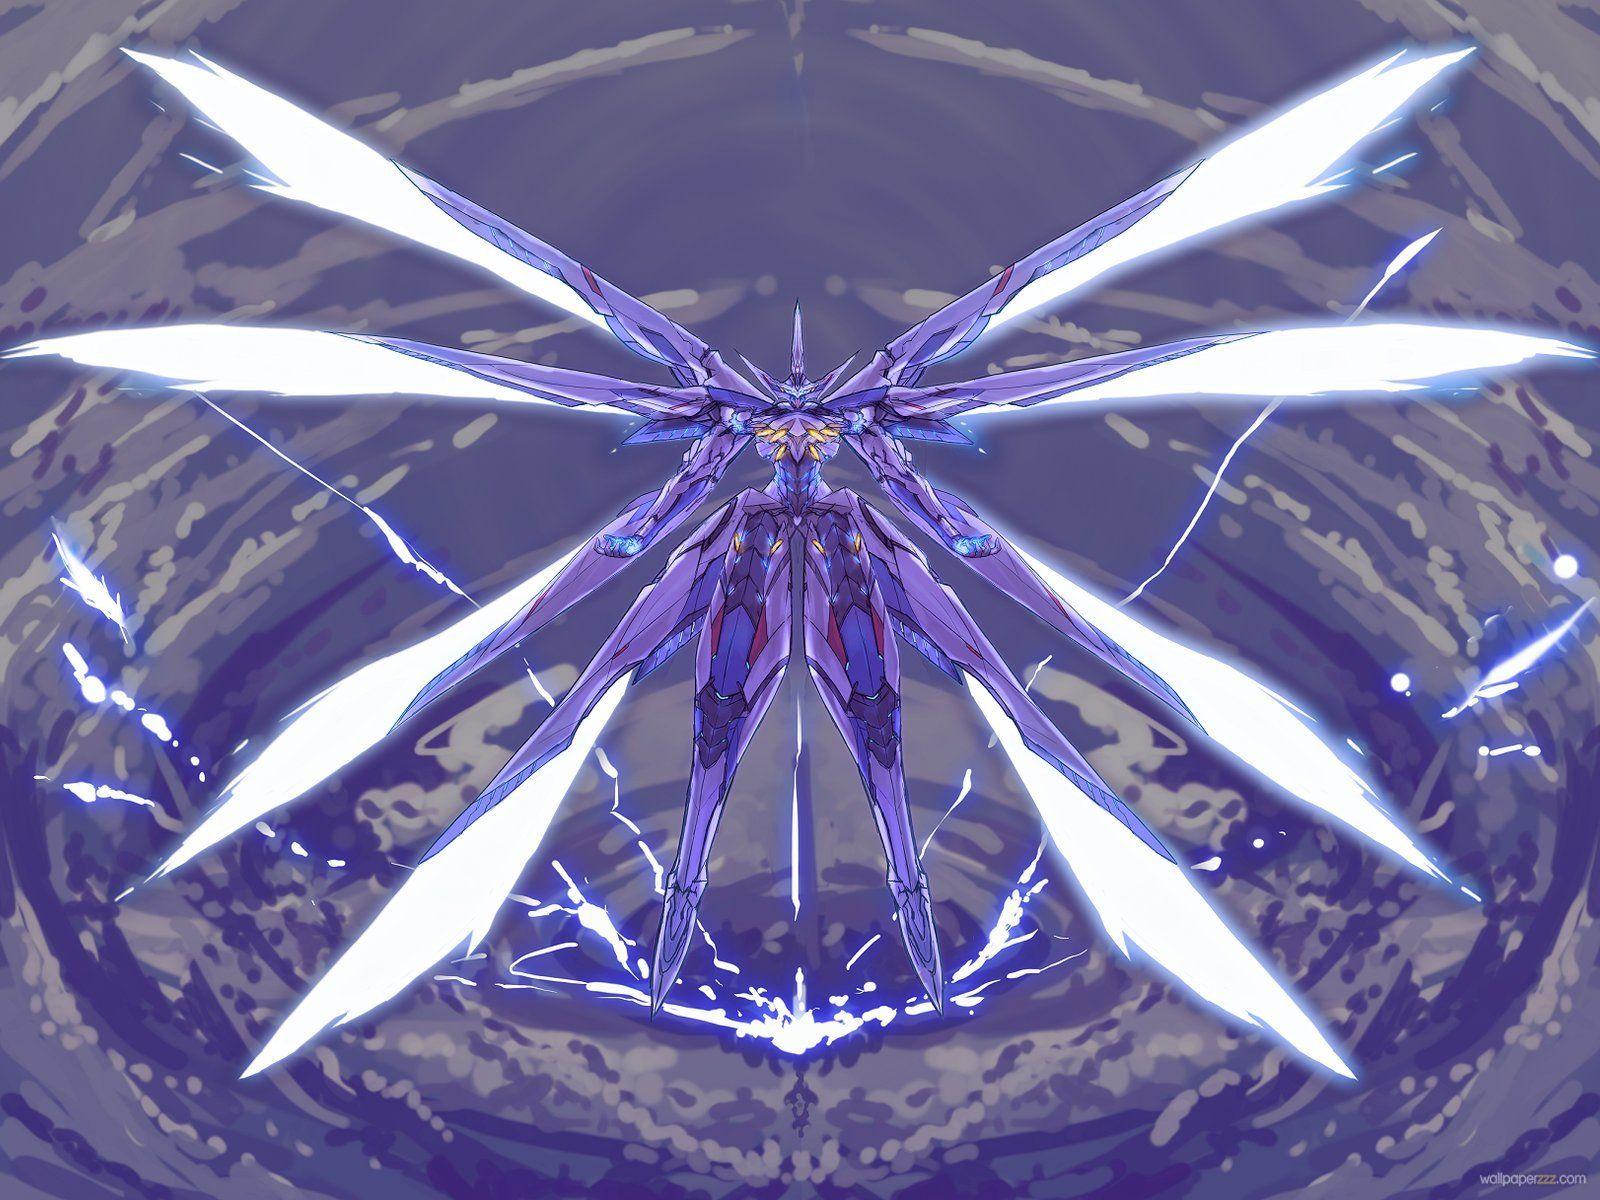 Xenogears download xenogears wallpaperanime wallpaper pics xenogears download xenogears wallpaperanime wallpaper gumiabroncs Gallery